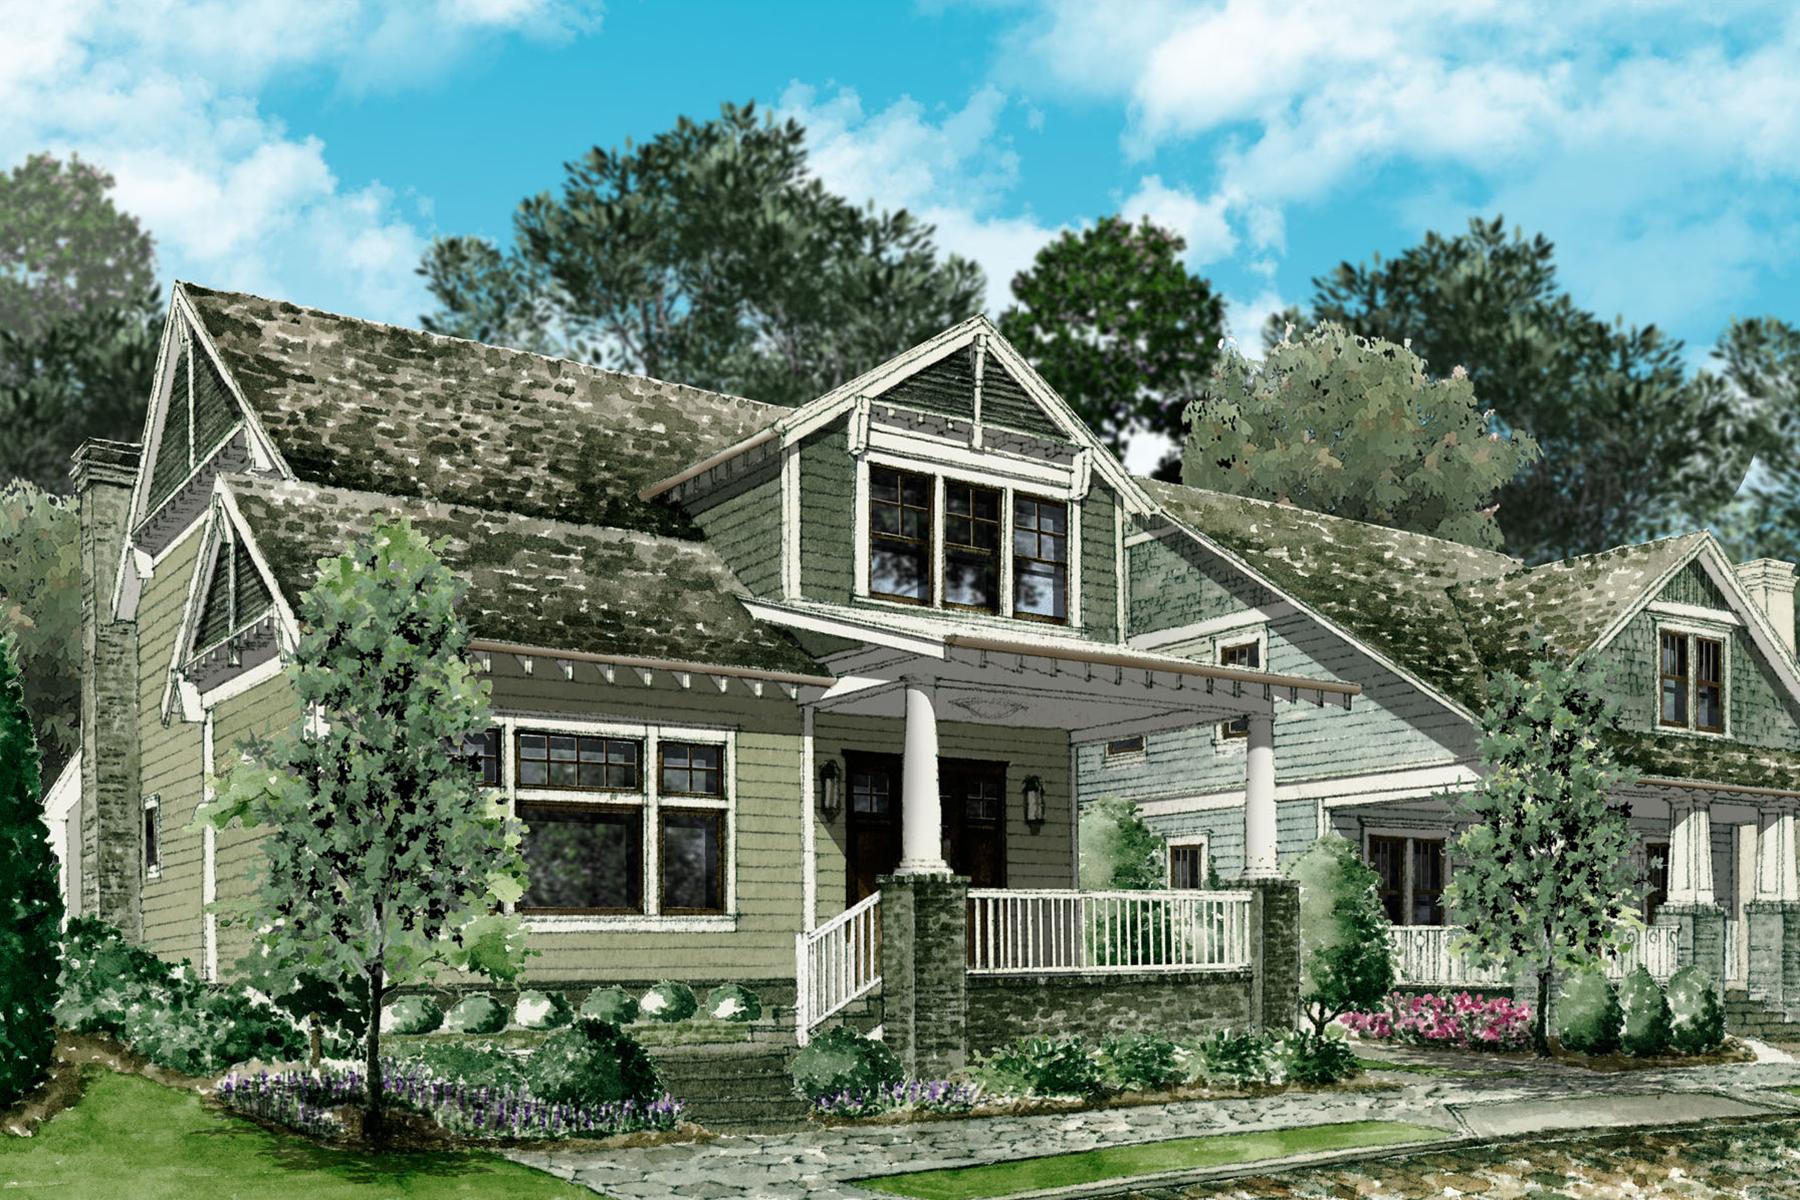 Single Family Homes для того Продажа на Inman Park New Construction Community 208 Haralson Lane NE, Atlanta, Джорджия 30307 Соединенные Штаты